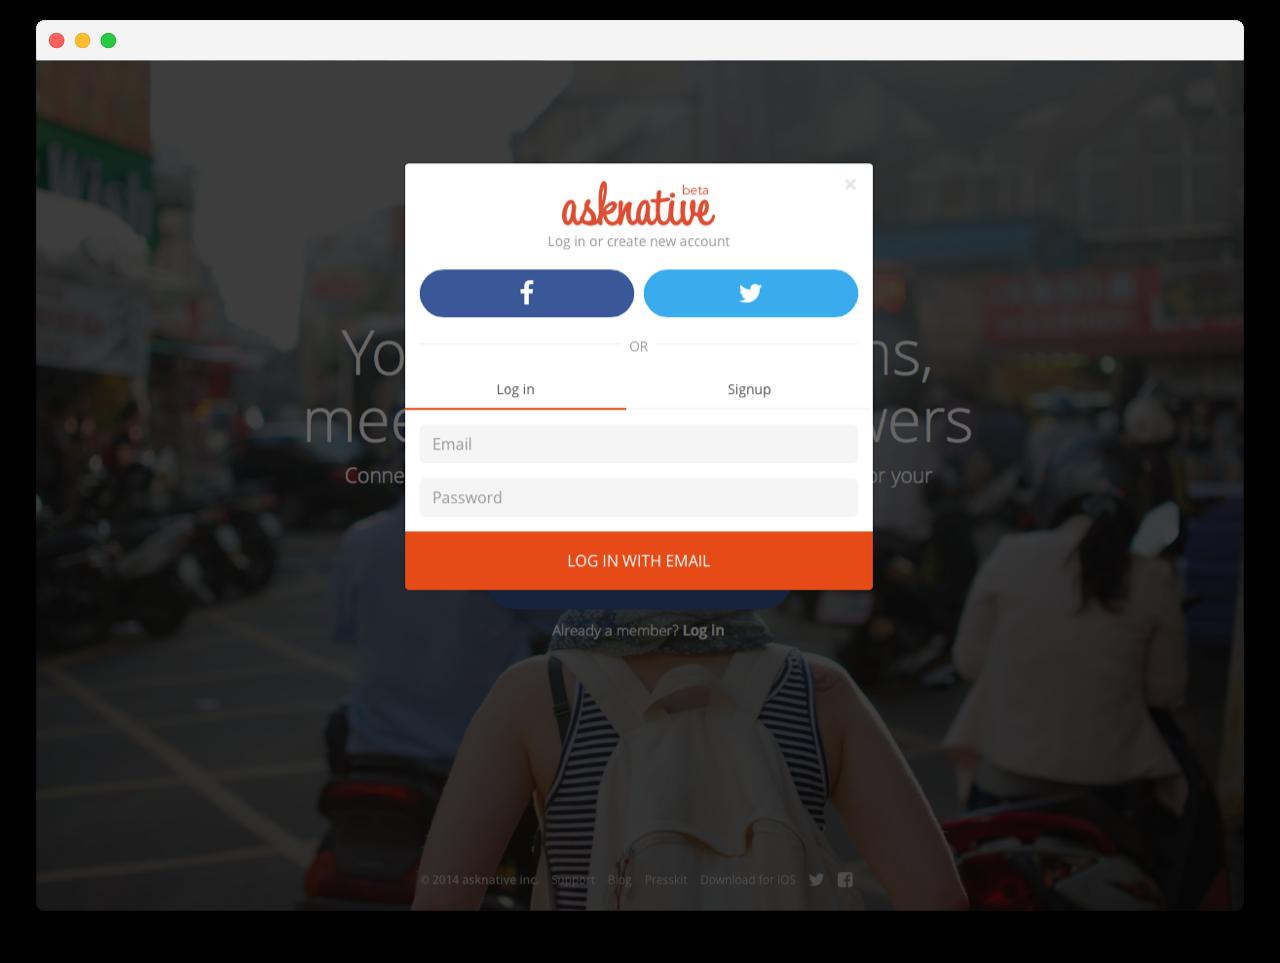 asknative-web-login-modal